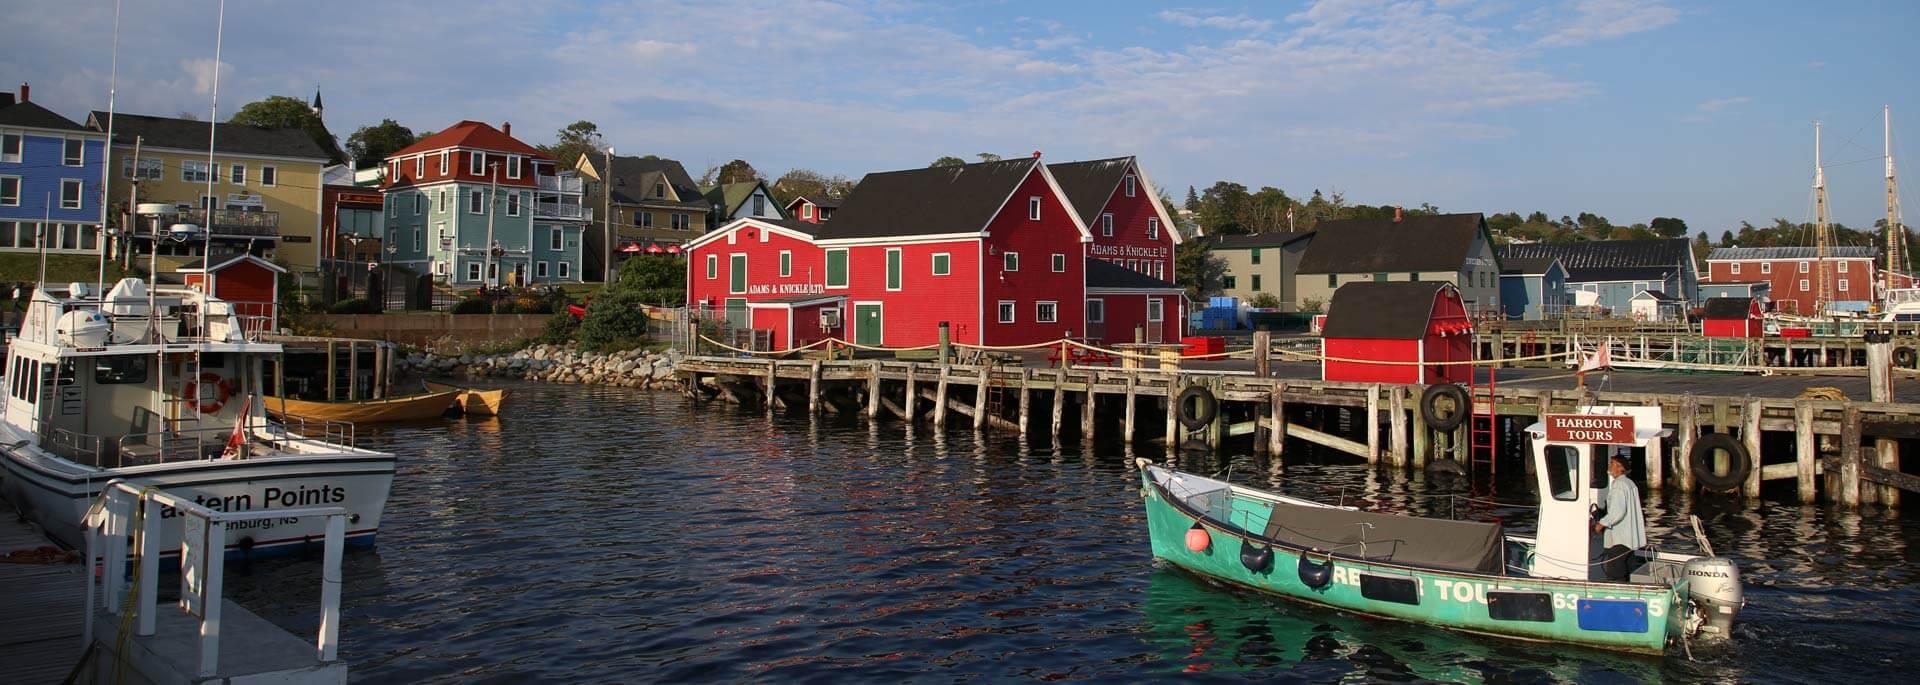 Fotos: Maritimes Lunenburg, Nova Scotia